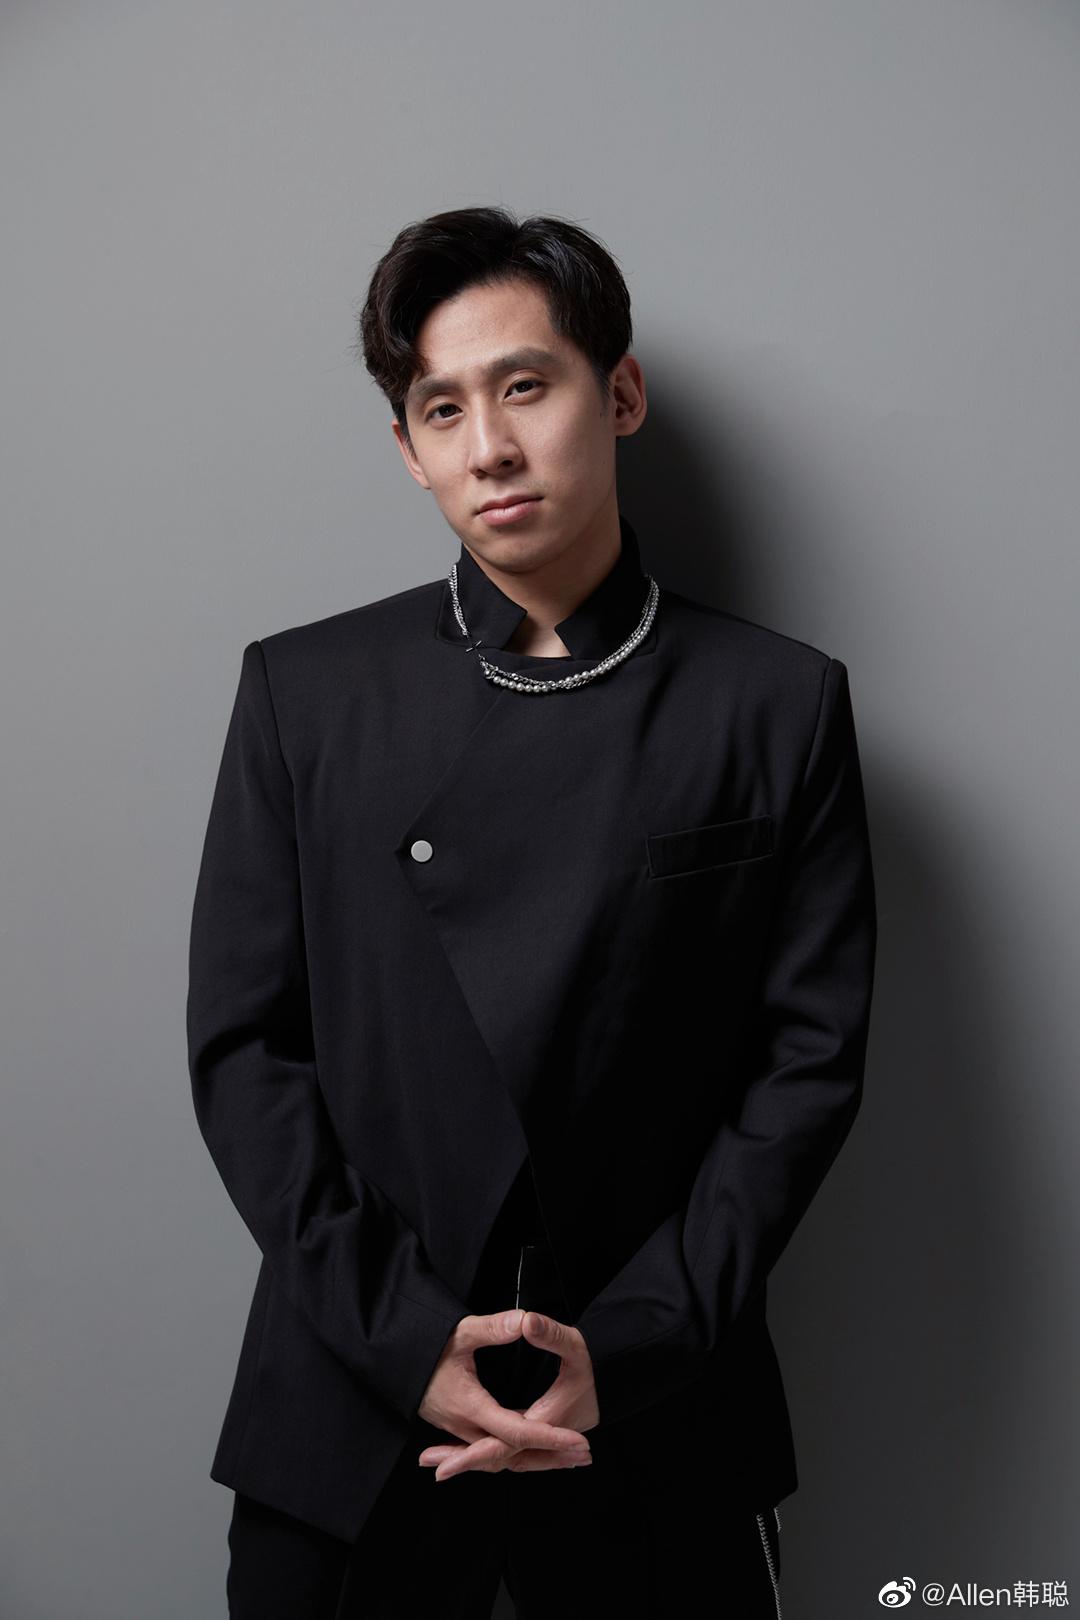 Вэньцзин Суй - Цун Хань / Wenjing SUI - Cong HAN CHN - Страница 18 Jz1i6e7kseecsf65uf0gkj4